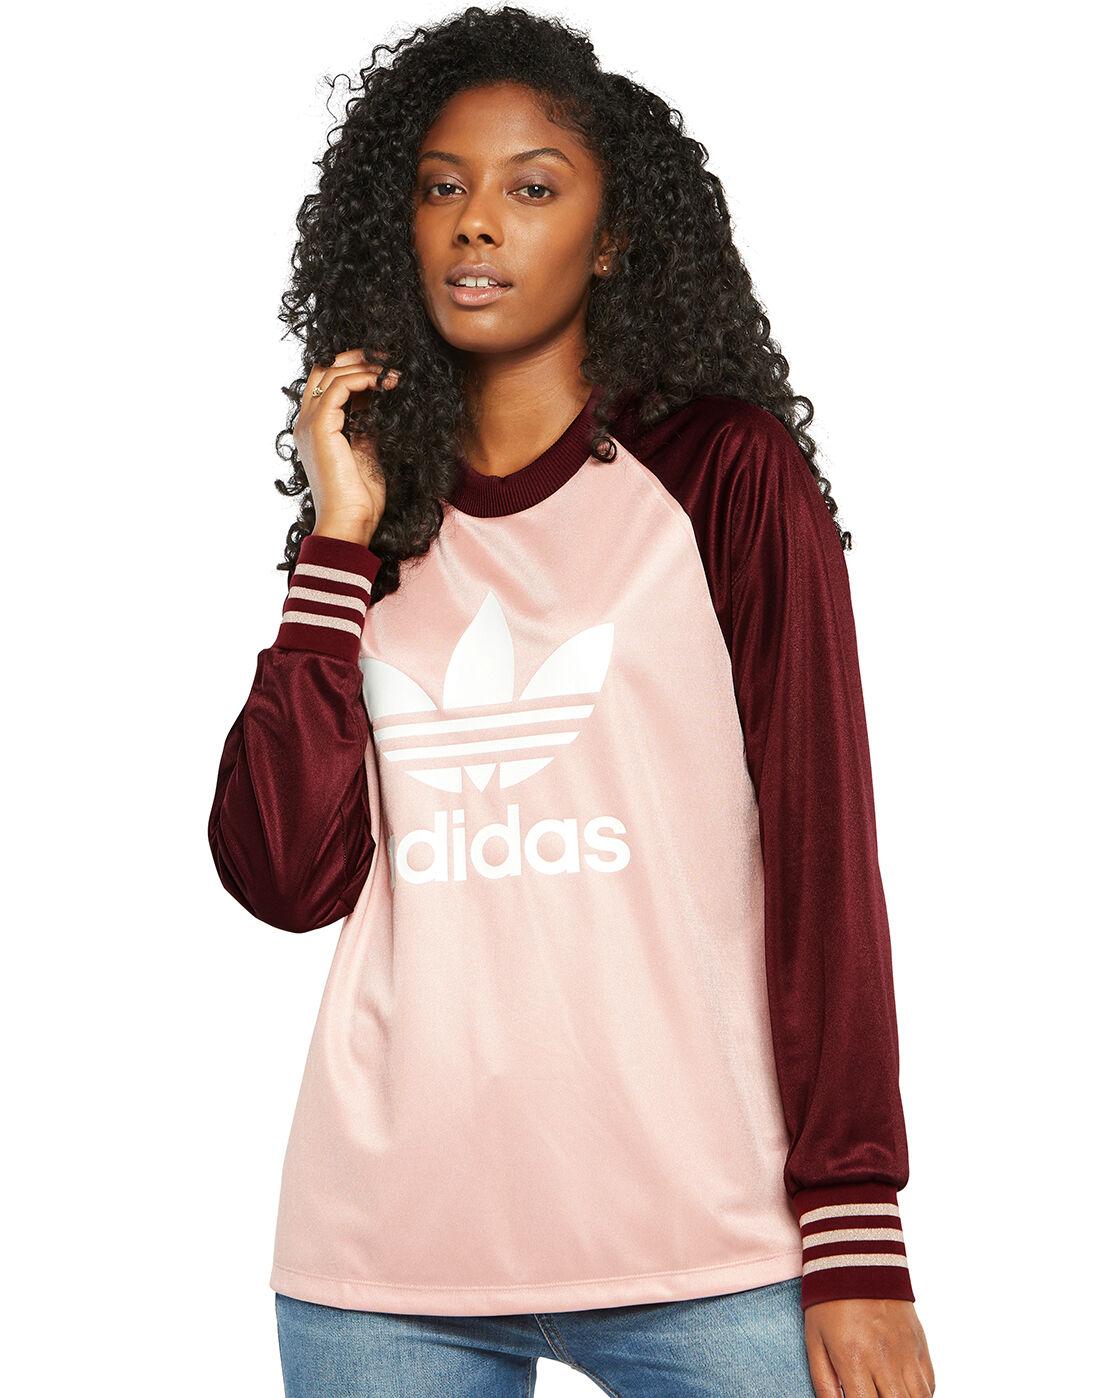 adidas Girls Long Sleeve Hooded Tee T-Shirt